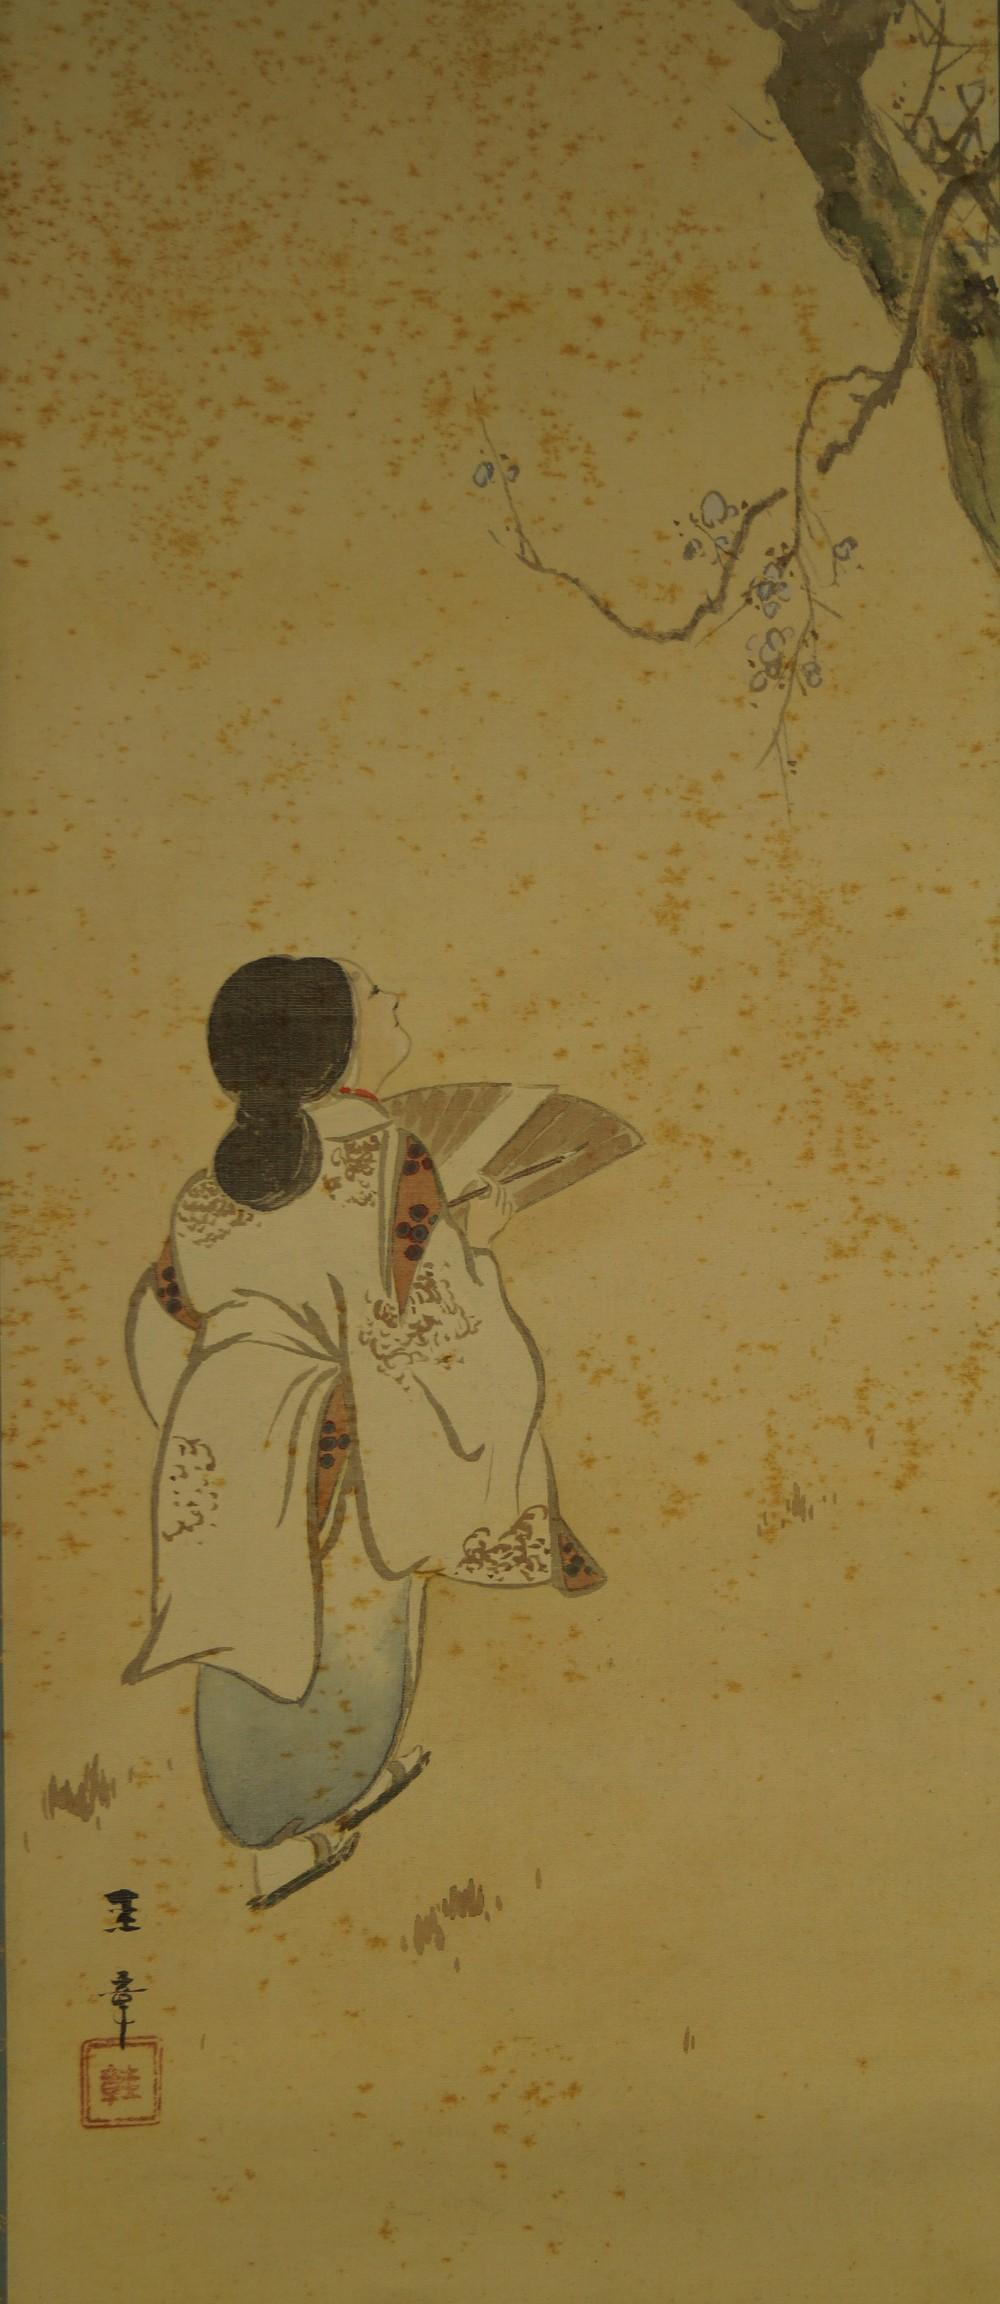 Frühling - Japanisches Rollbild (Kakejiku, Kakemono)